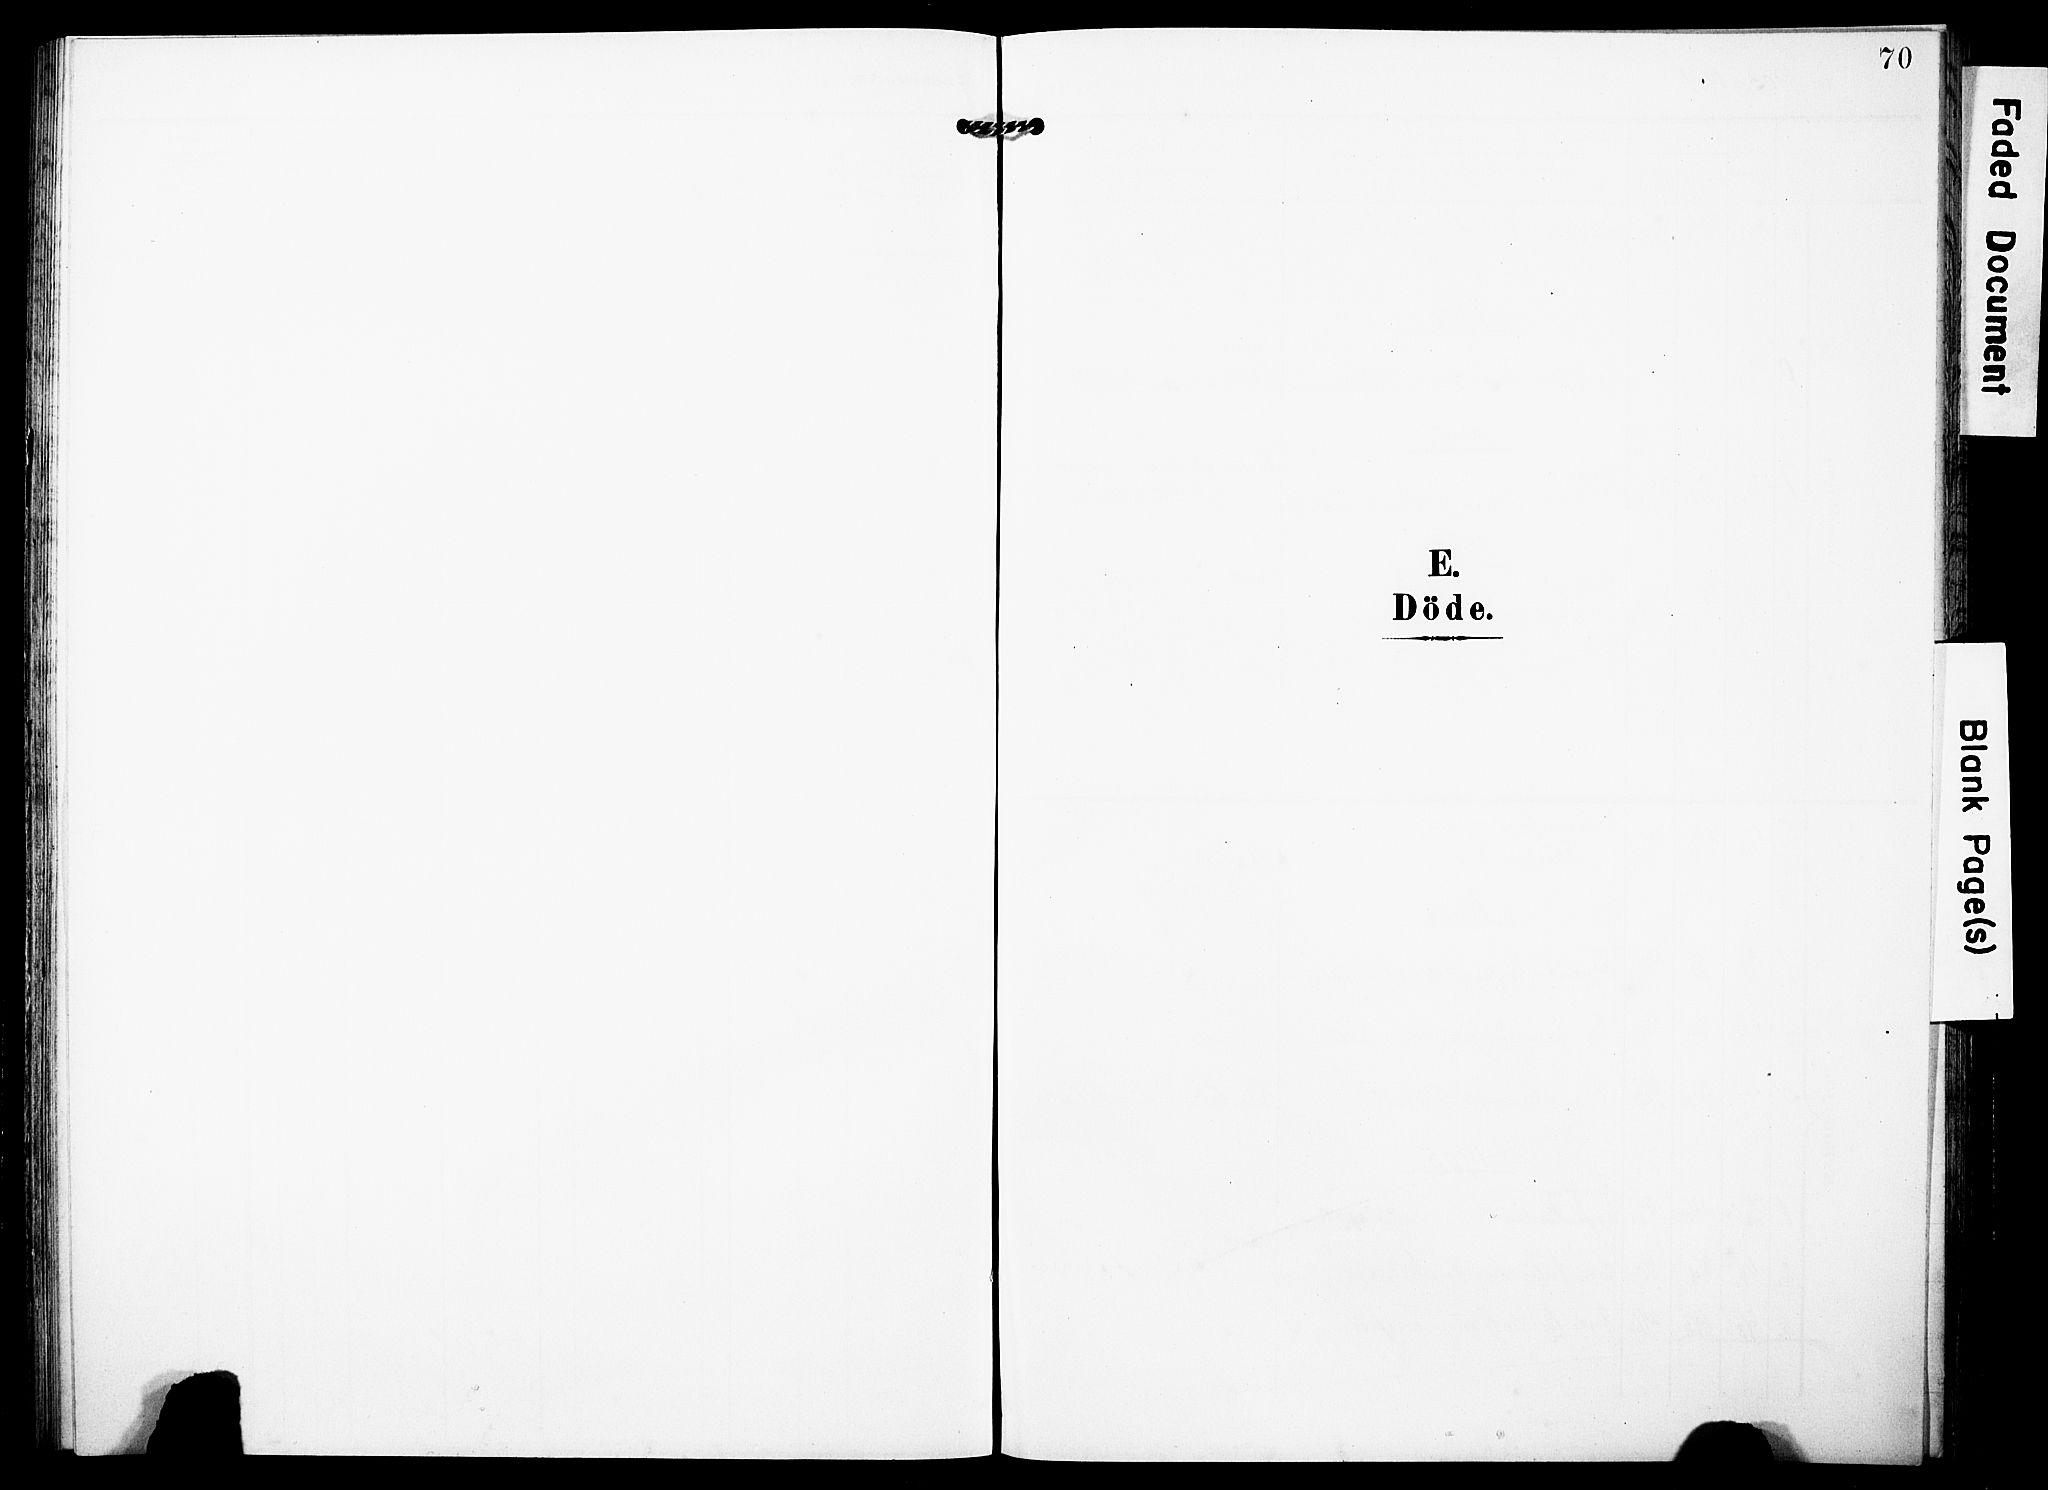 SAST, Torvastad sokneprestkontor, H/Ha/Haa/L0018: Ministerialbok nr. A 17, 1903-1925, s. 70